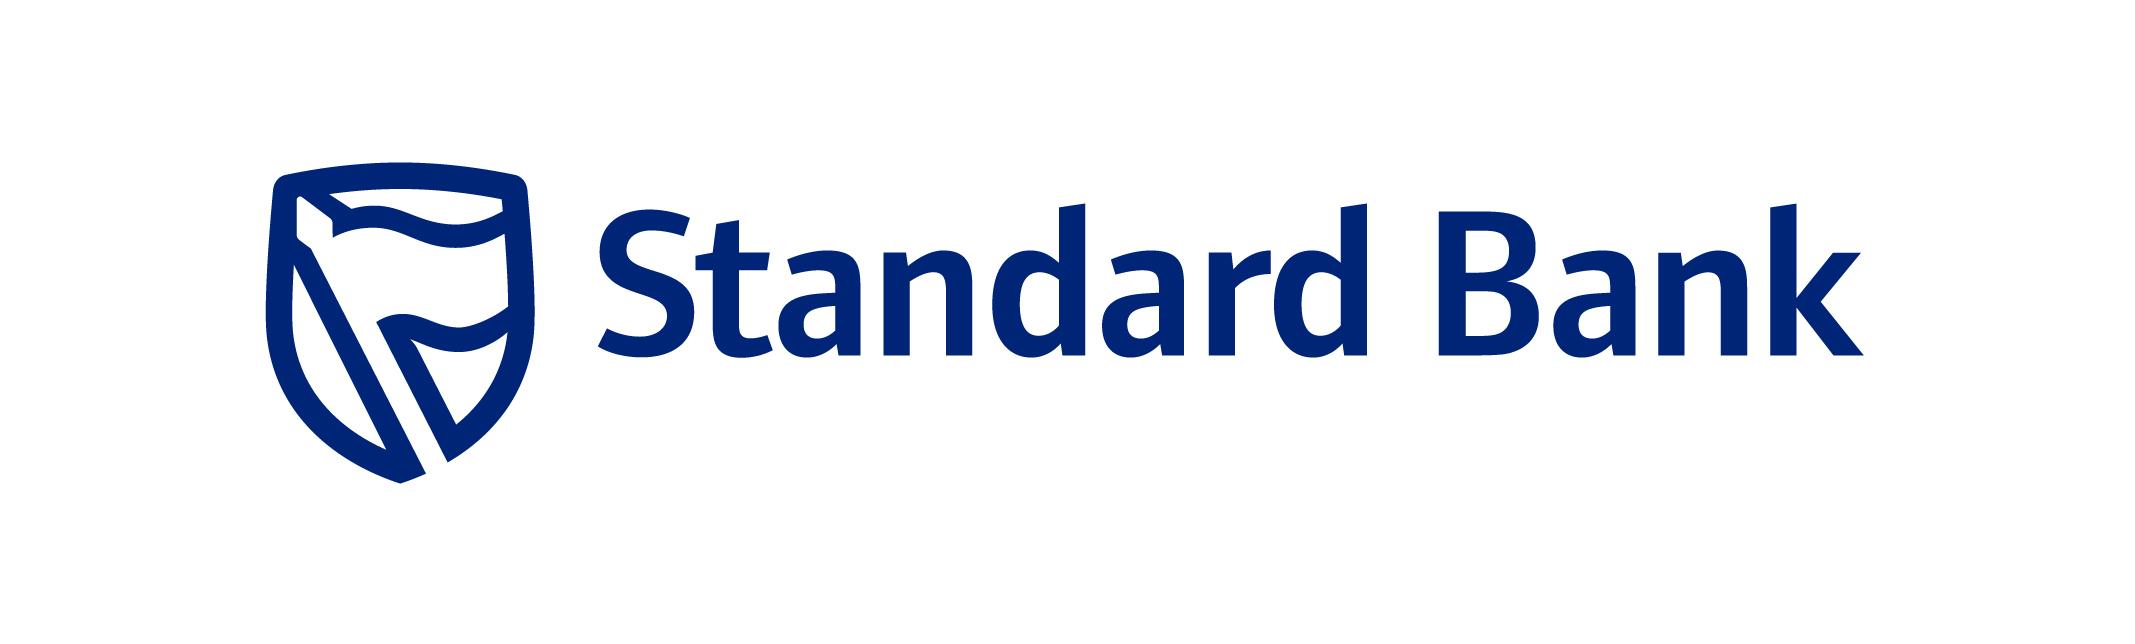 StandardBank-logo.jpg